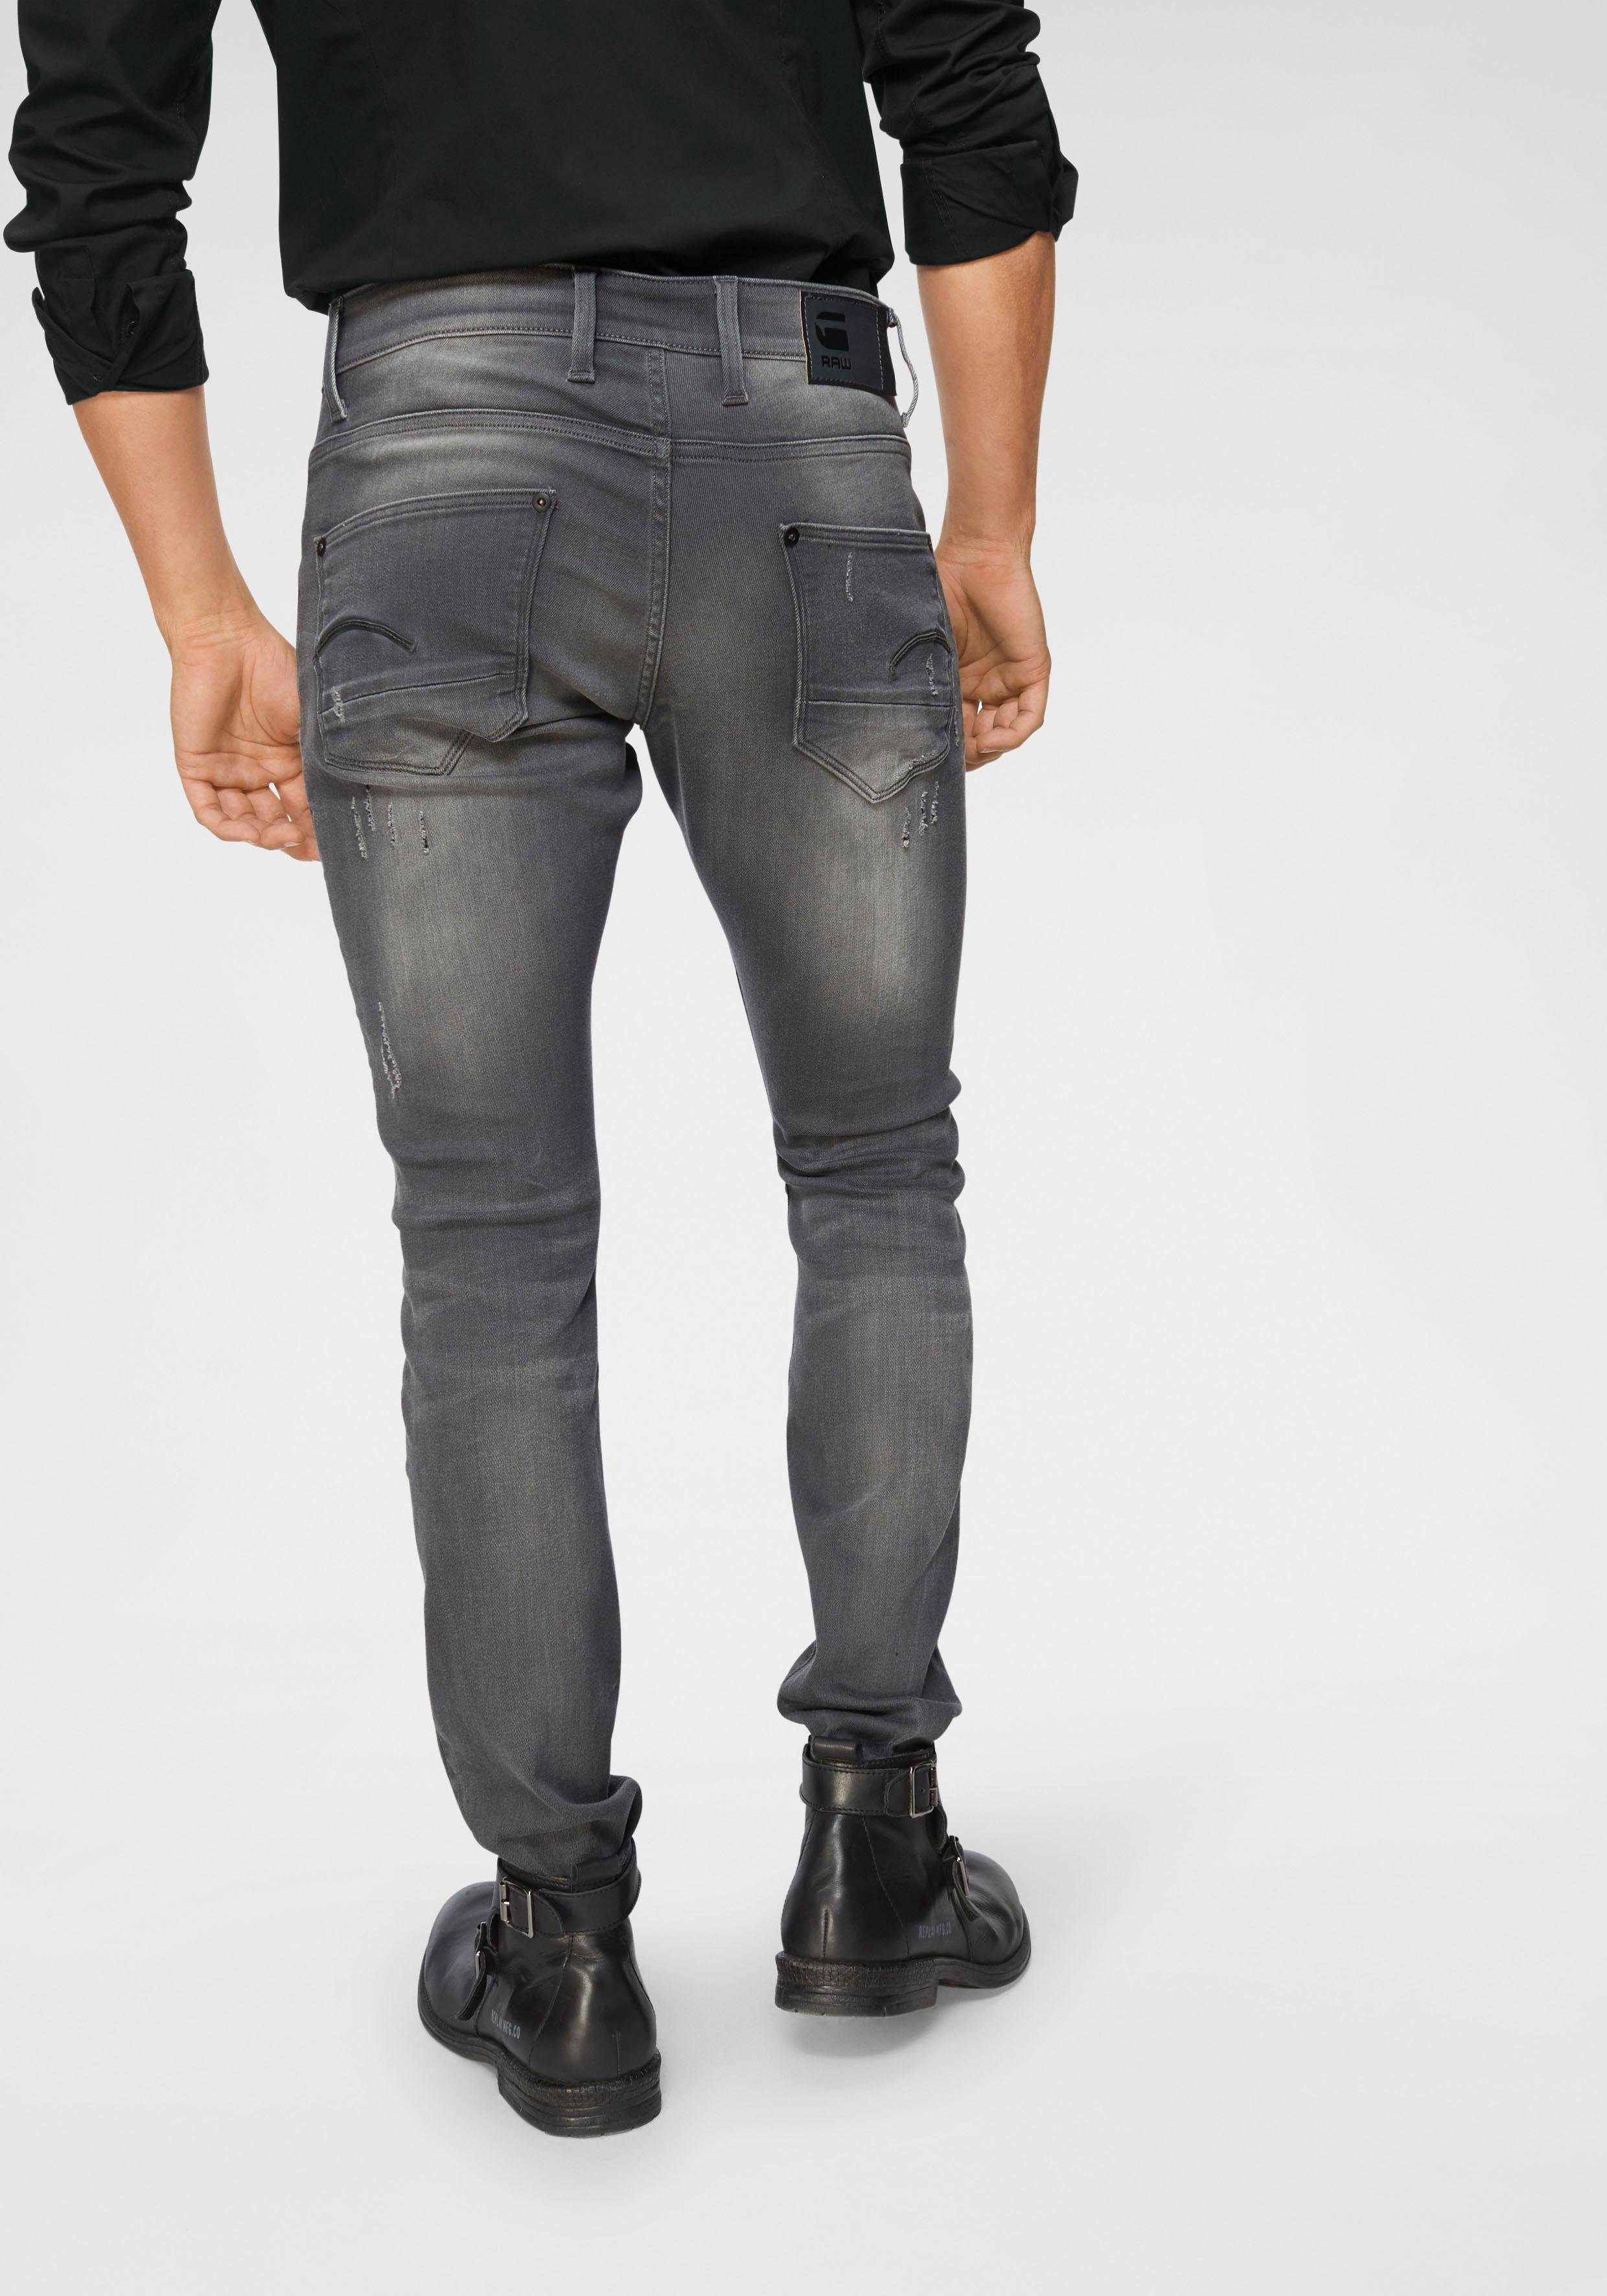 G-Star RAW Slim-fit-Jeans »Revend Super Slim«